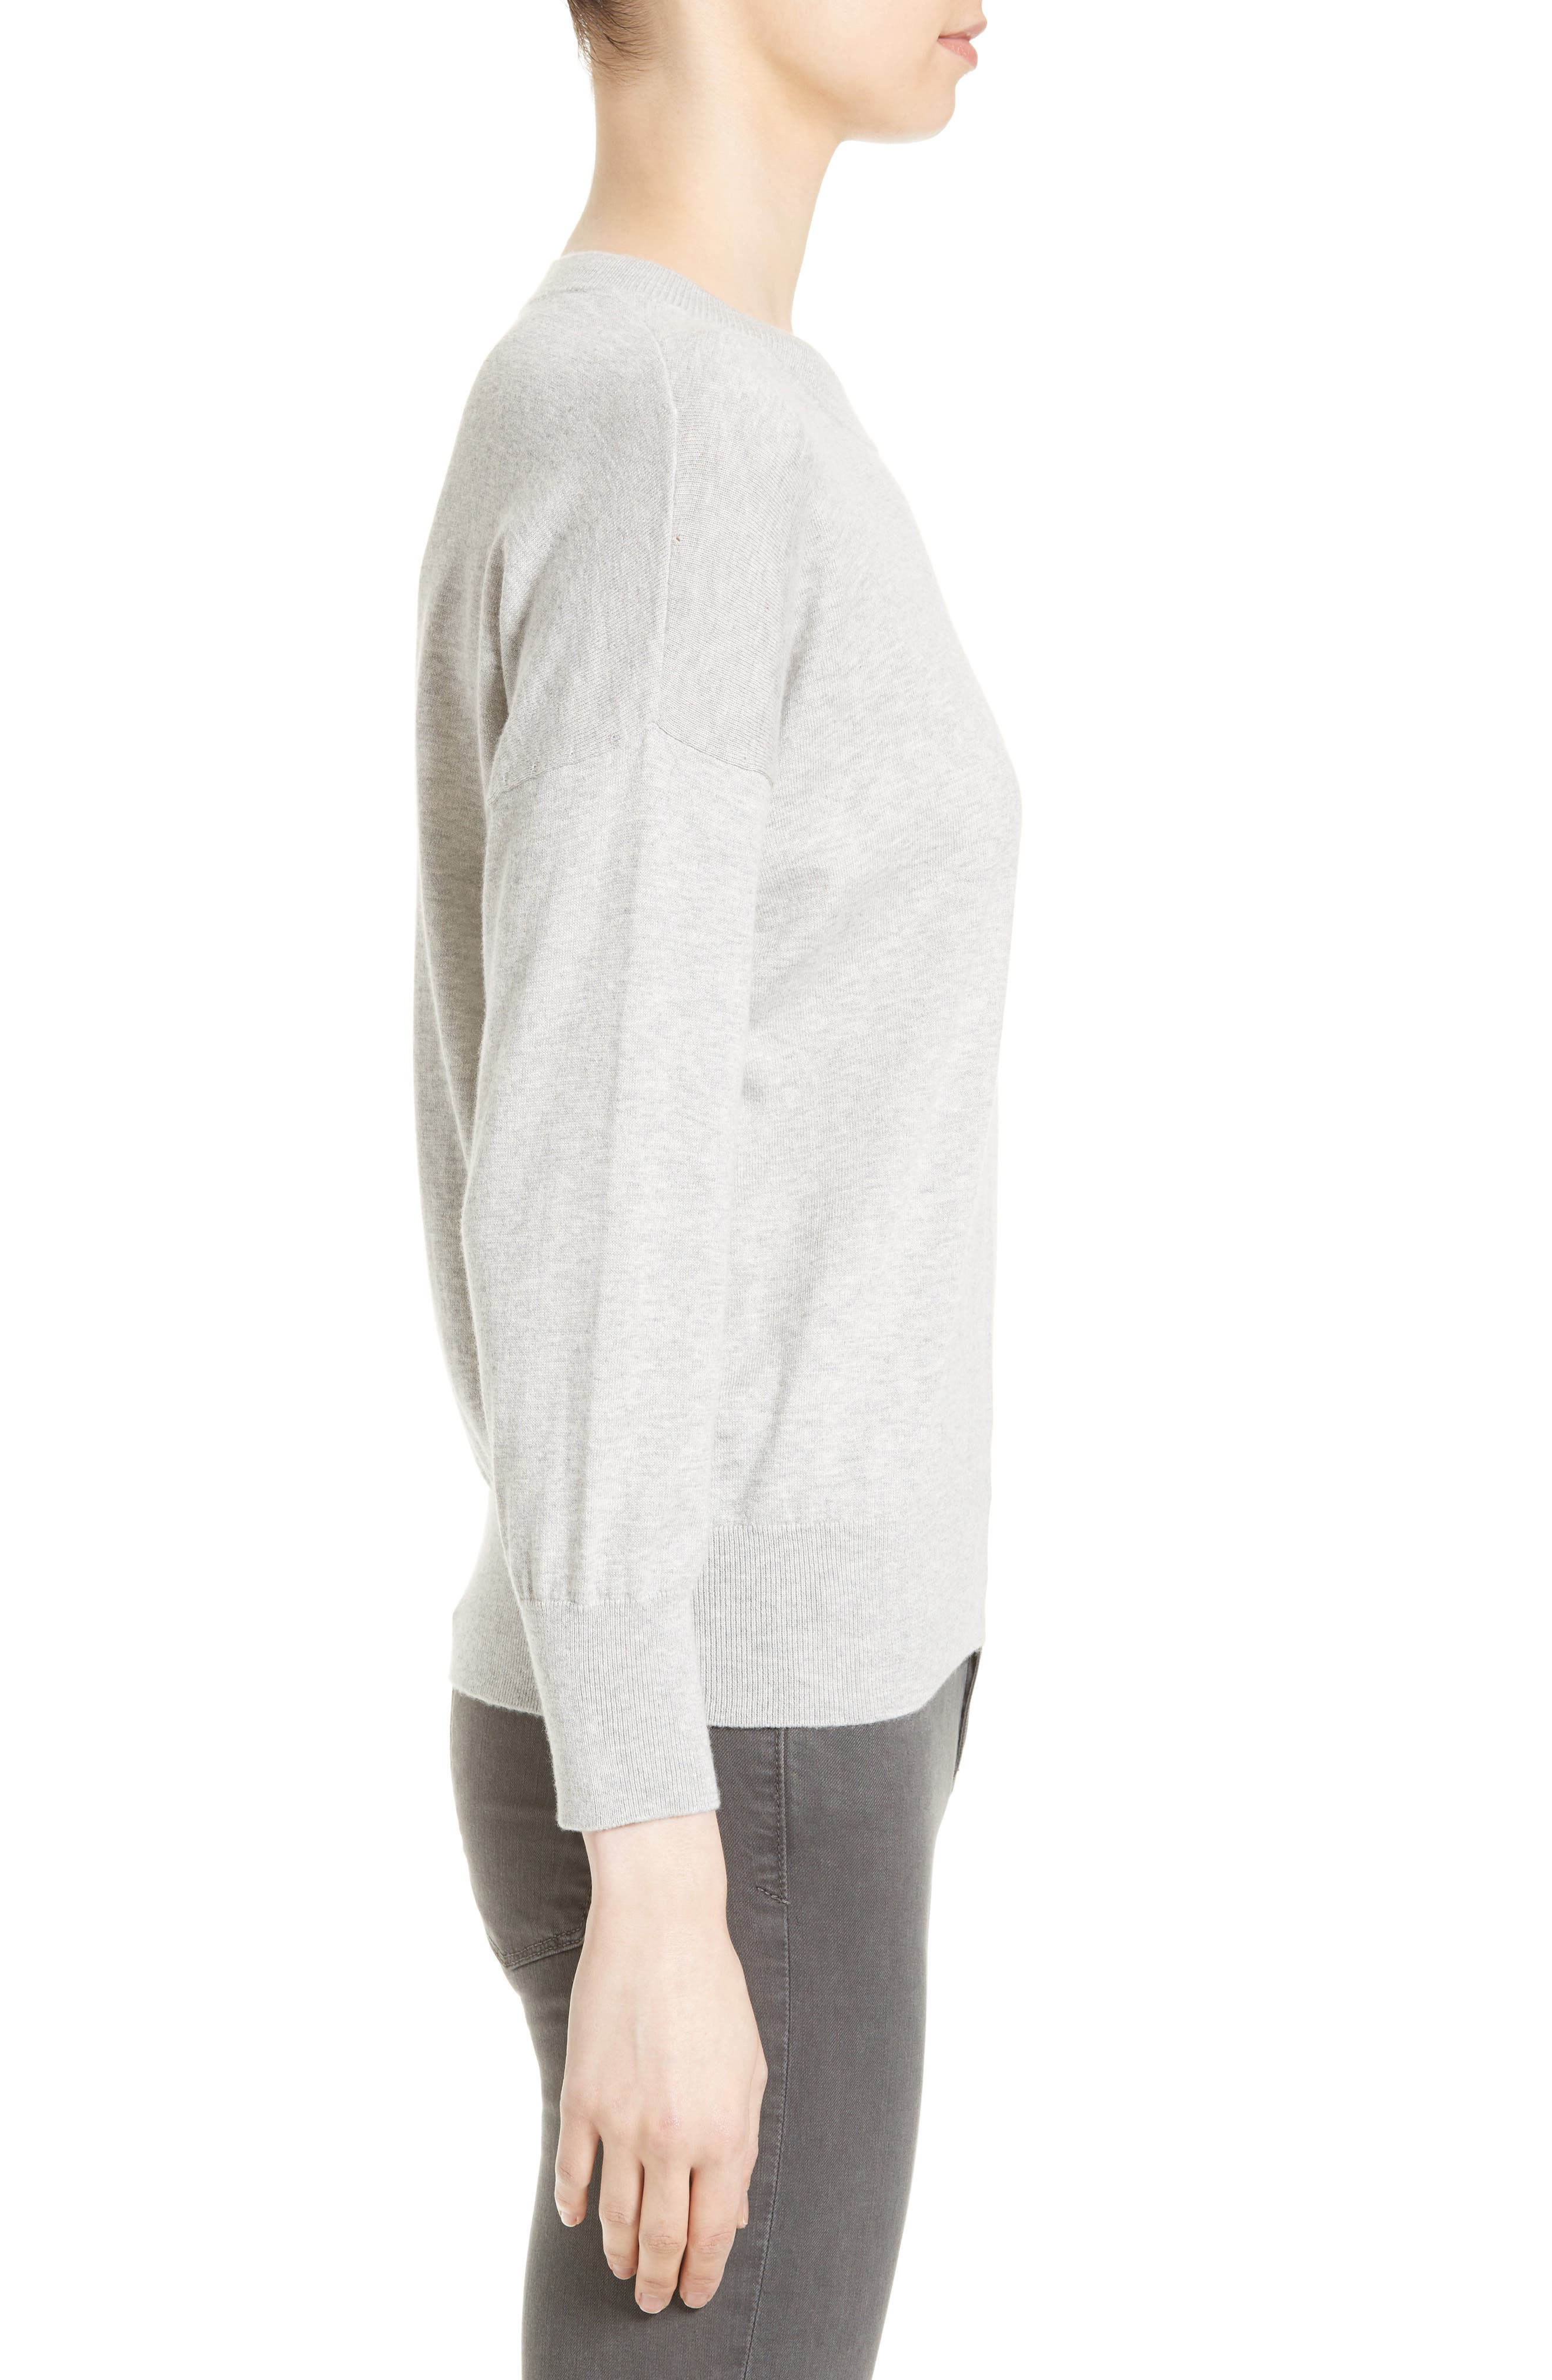 Melanie Cotton & Cashmere Pullover,                             Alternate thumbnail 3, color,                             Light Heather Grey